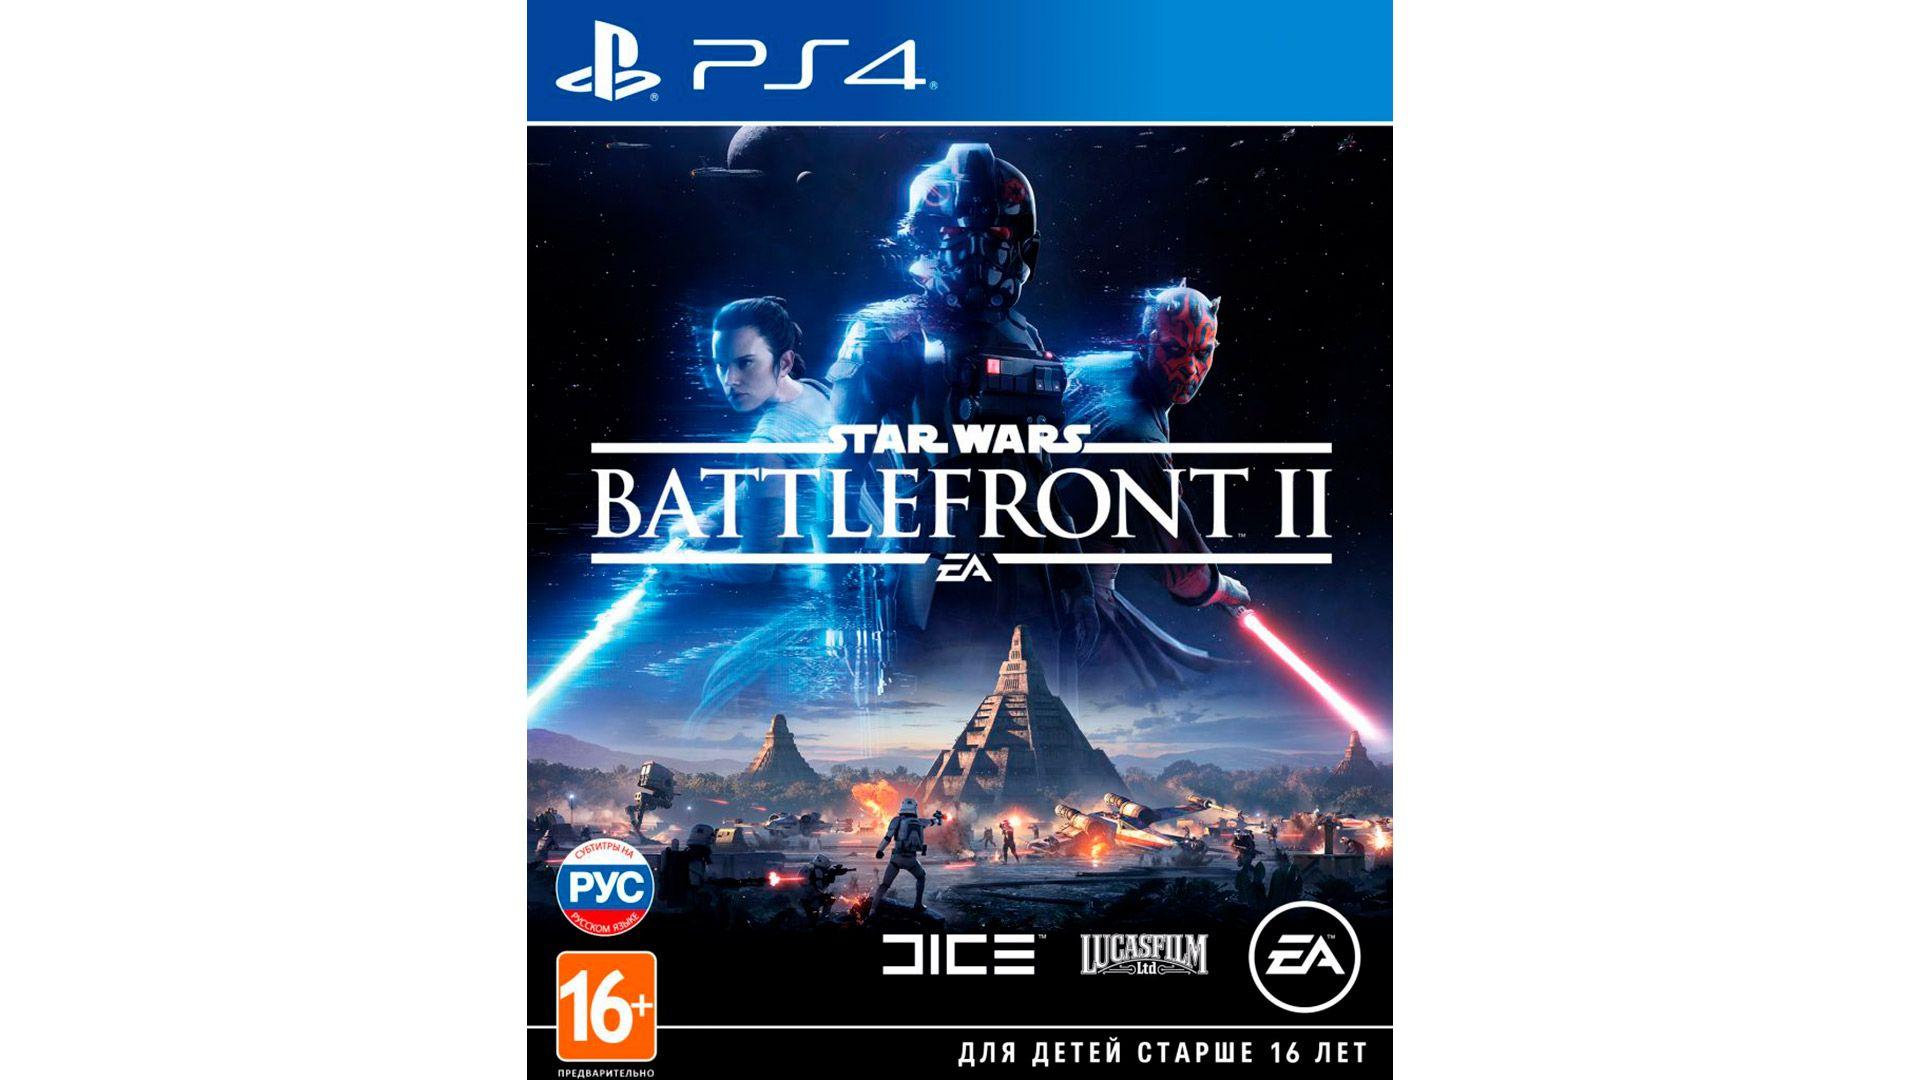 Star Wars Battlefront II для Sony PlayStation 4 [PS4SWB2]